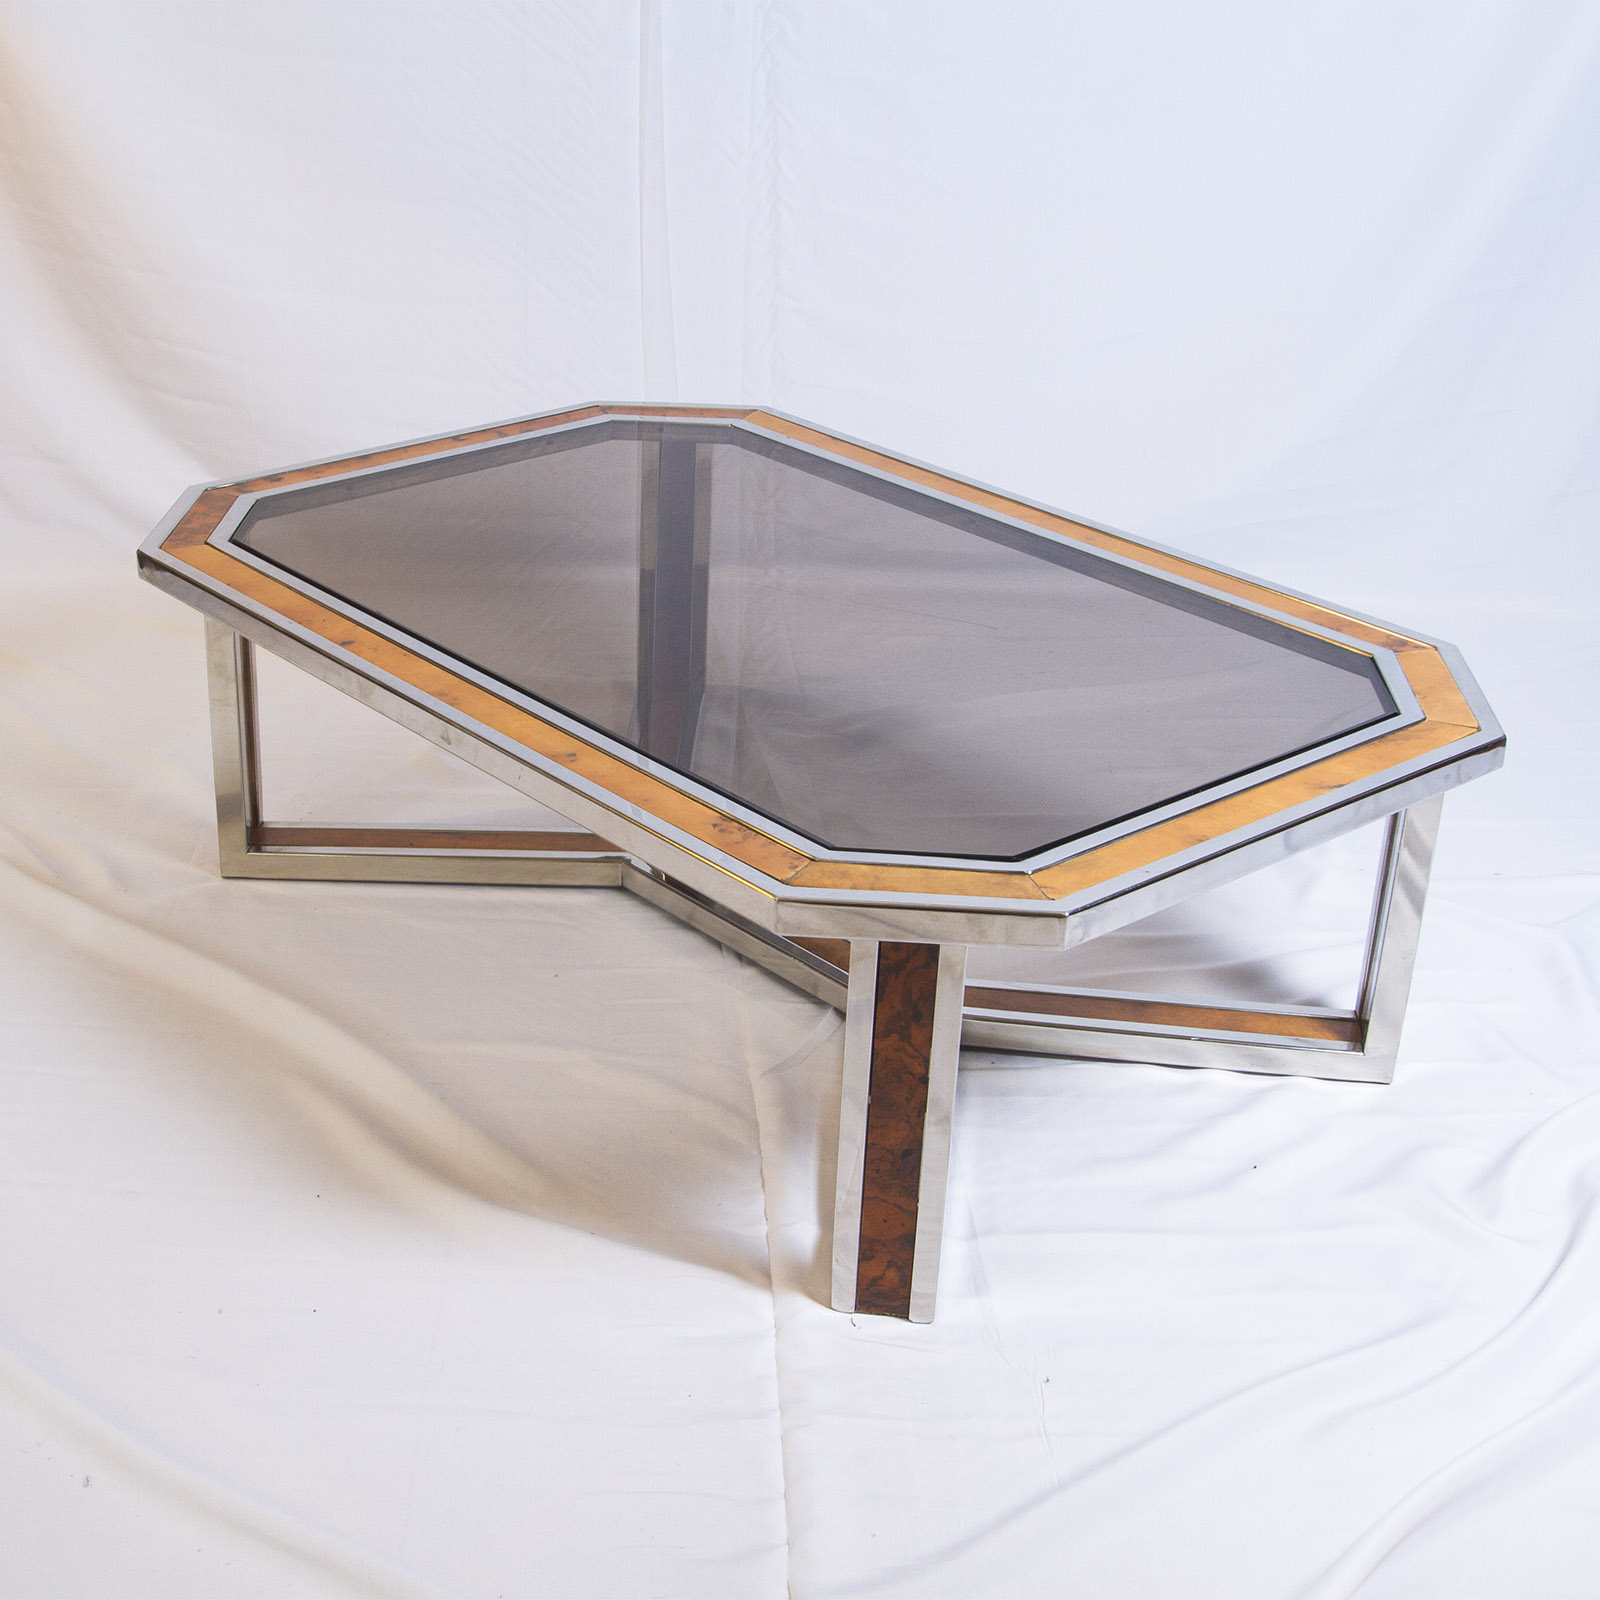 Solid Chrome Coffee Table: Coffee Table By Romeo Rega